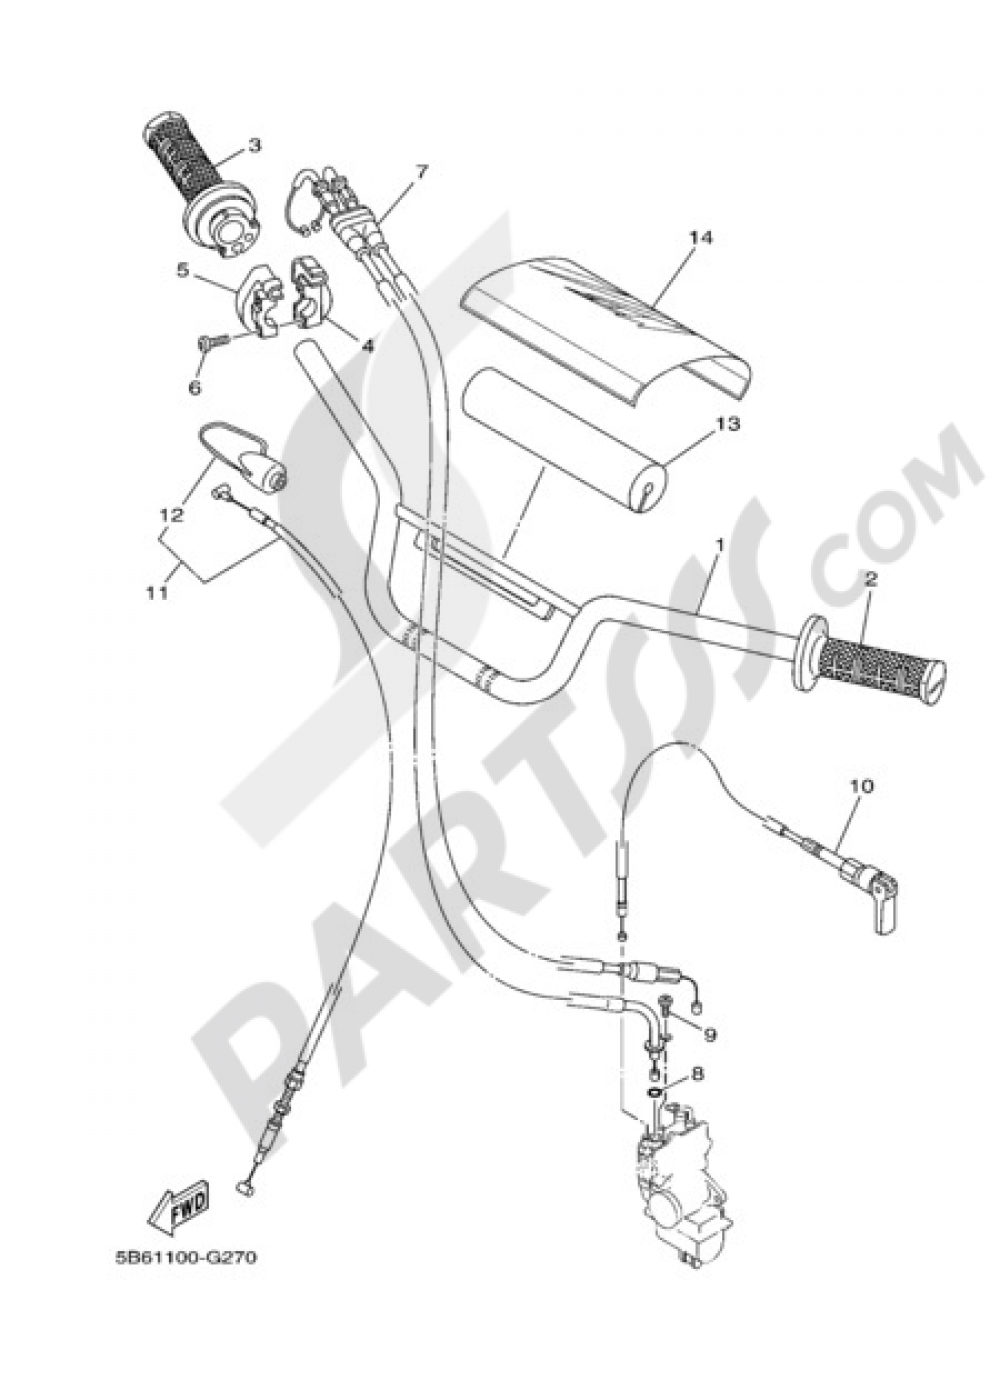 STEERING HANDLE & CABLE Yamaha TT-R110E 2010